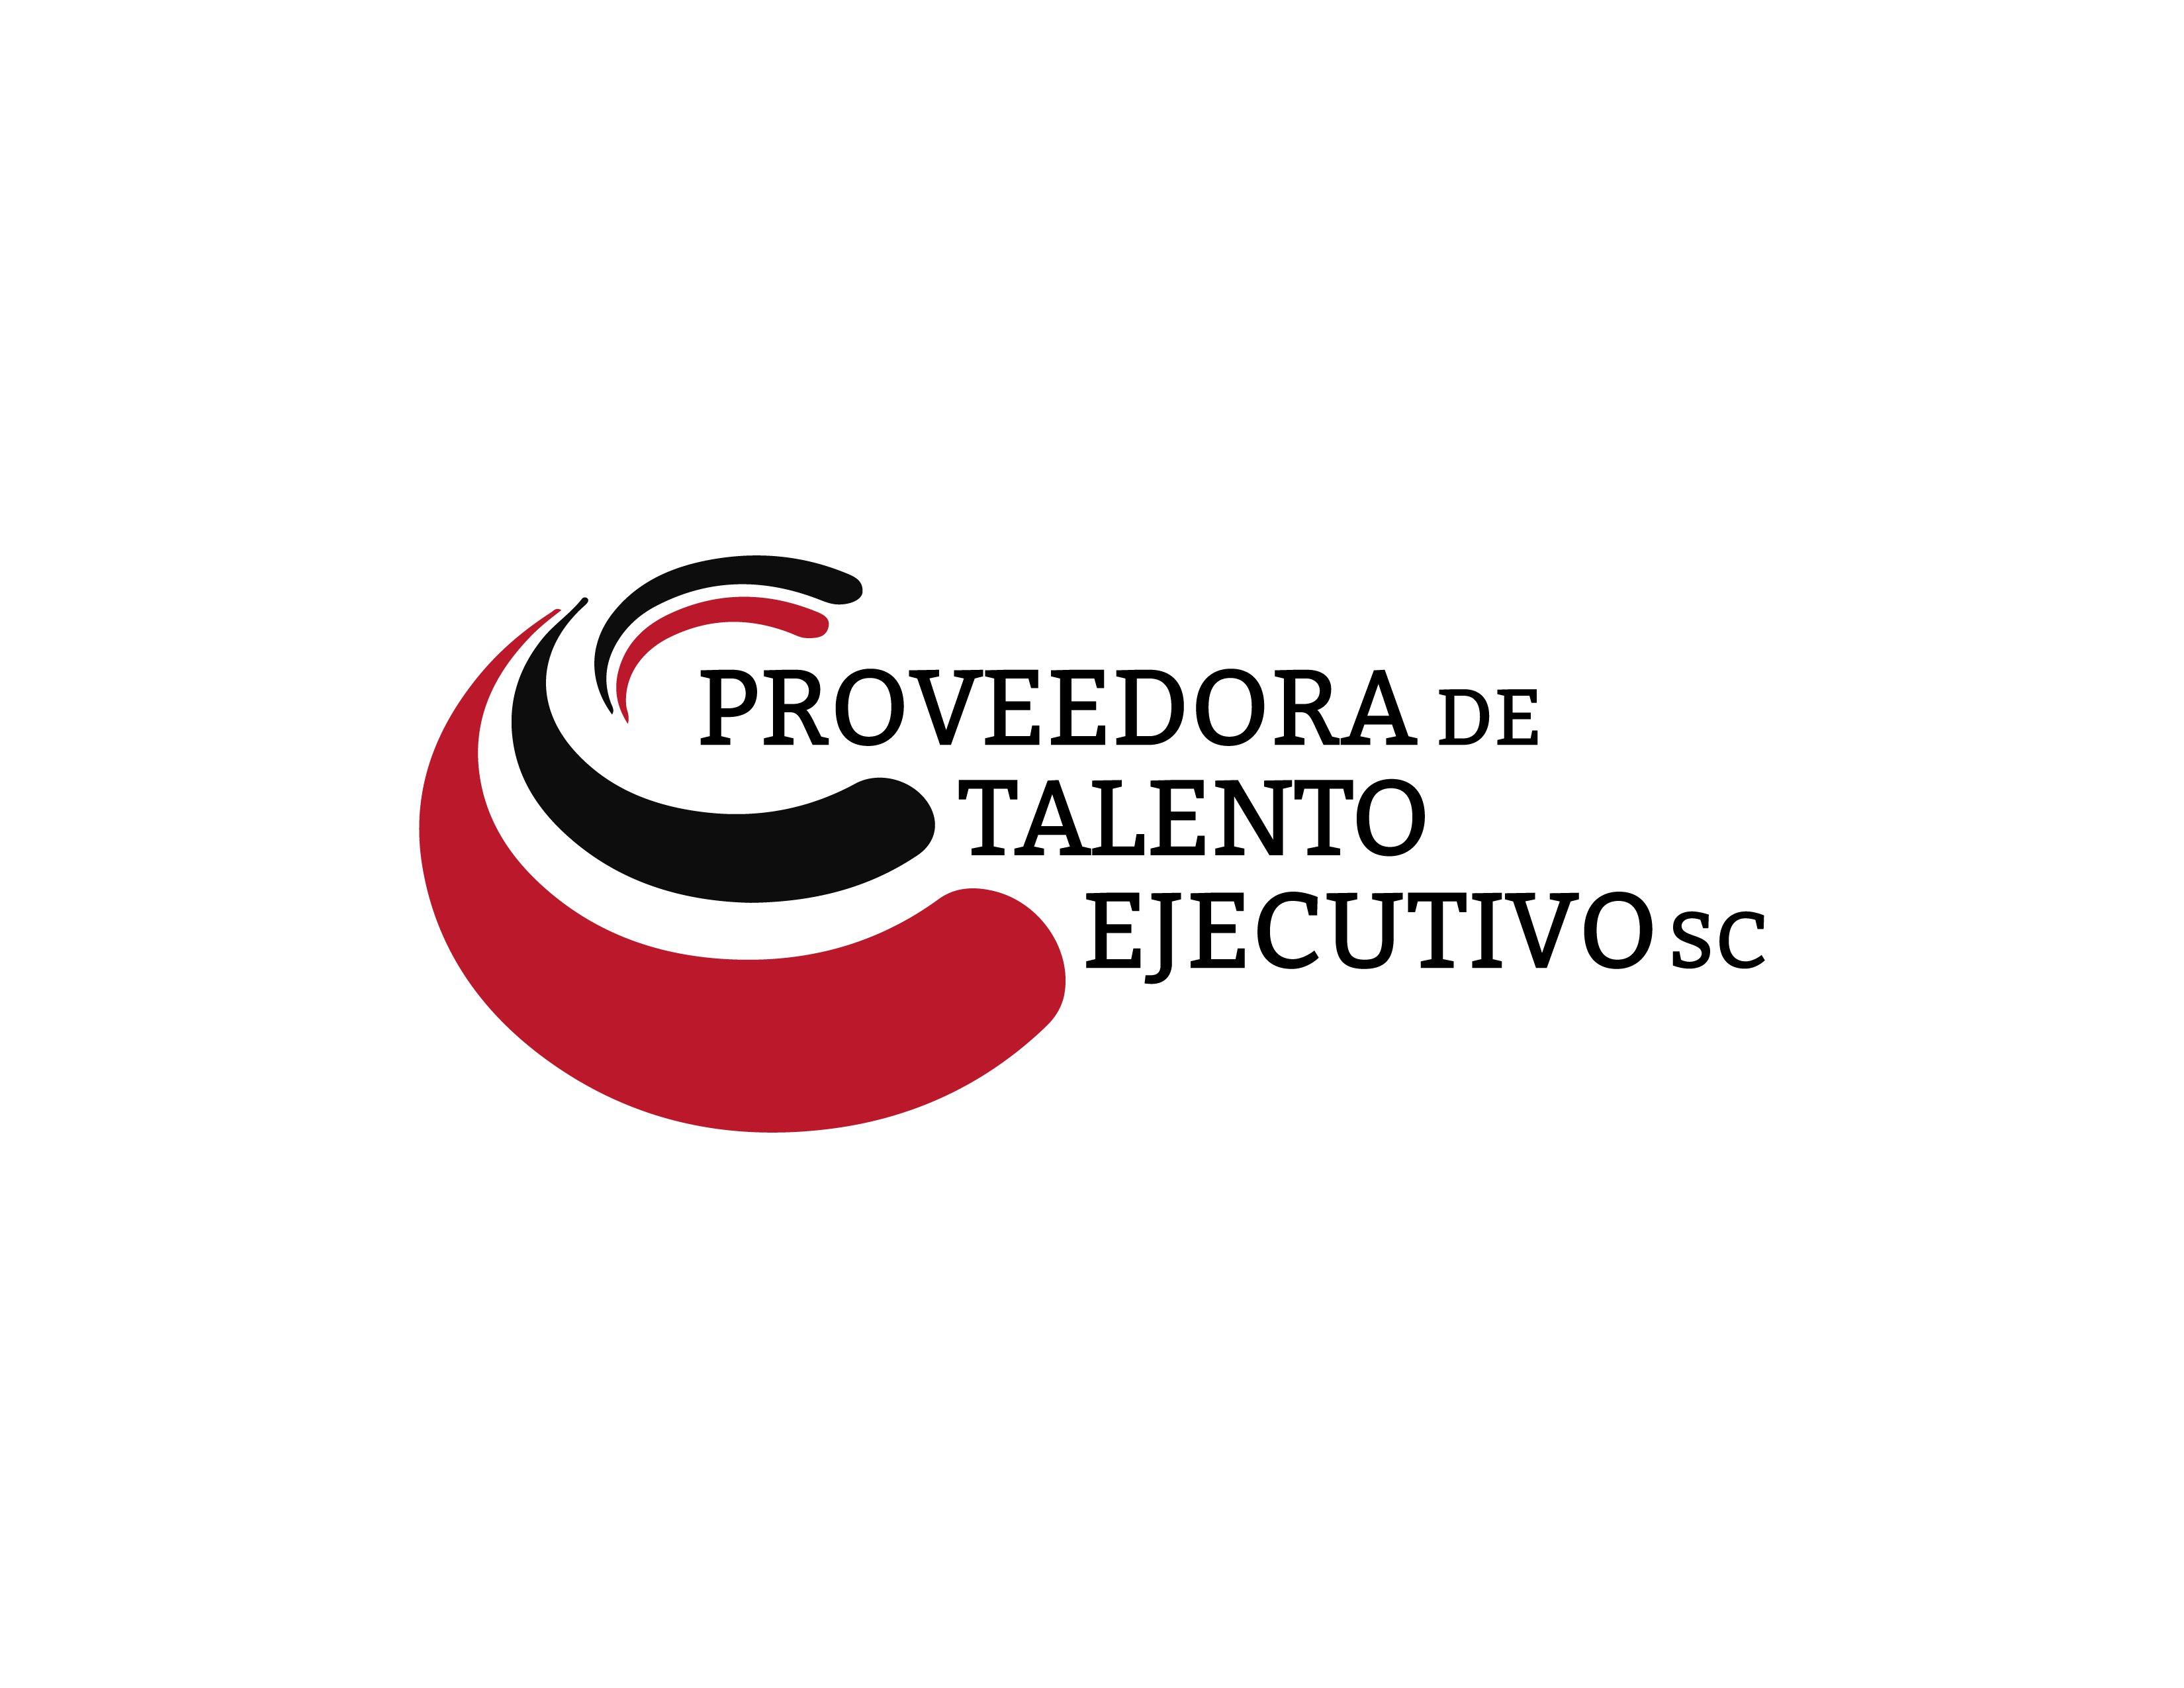 PROVEEDORA DE TALENTO EJECUTIVO